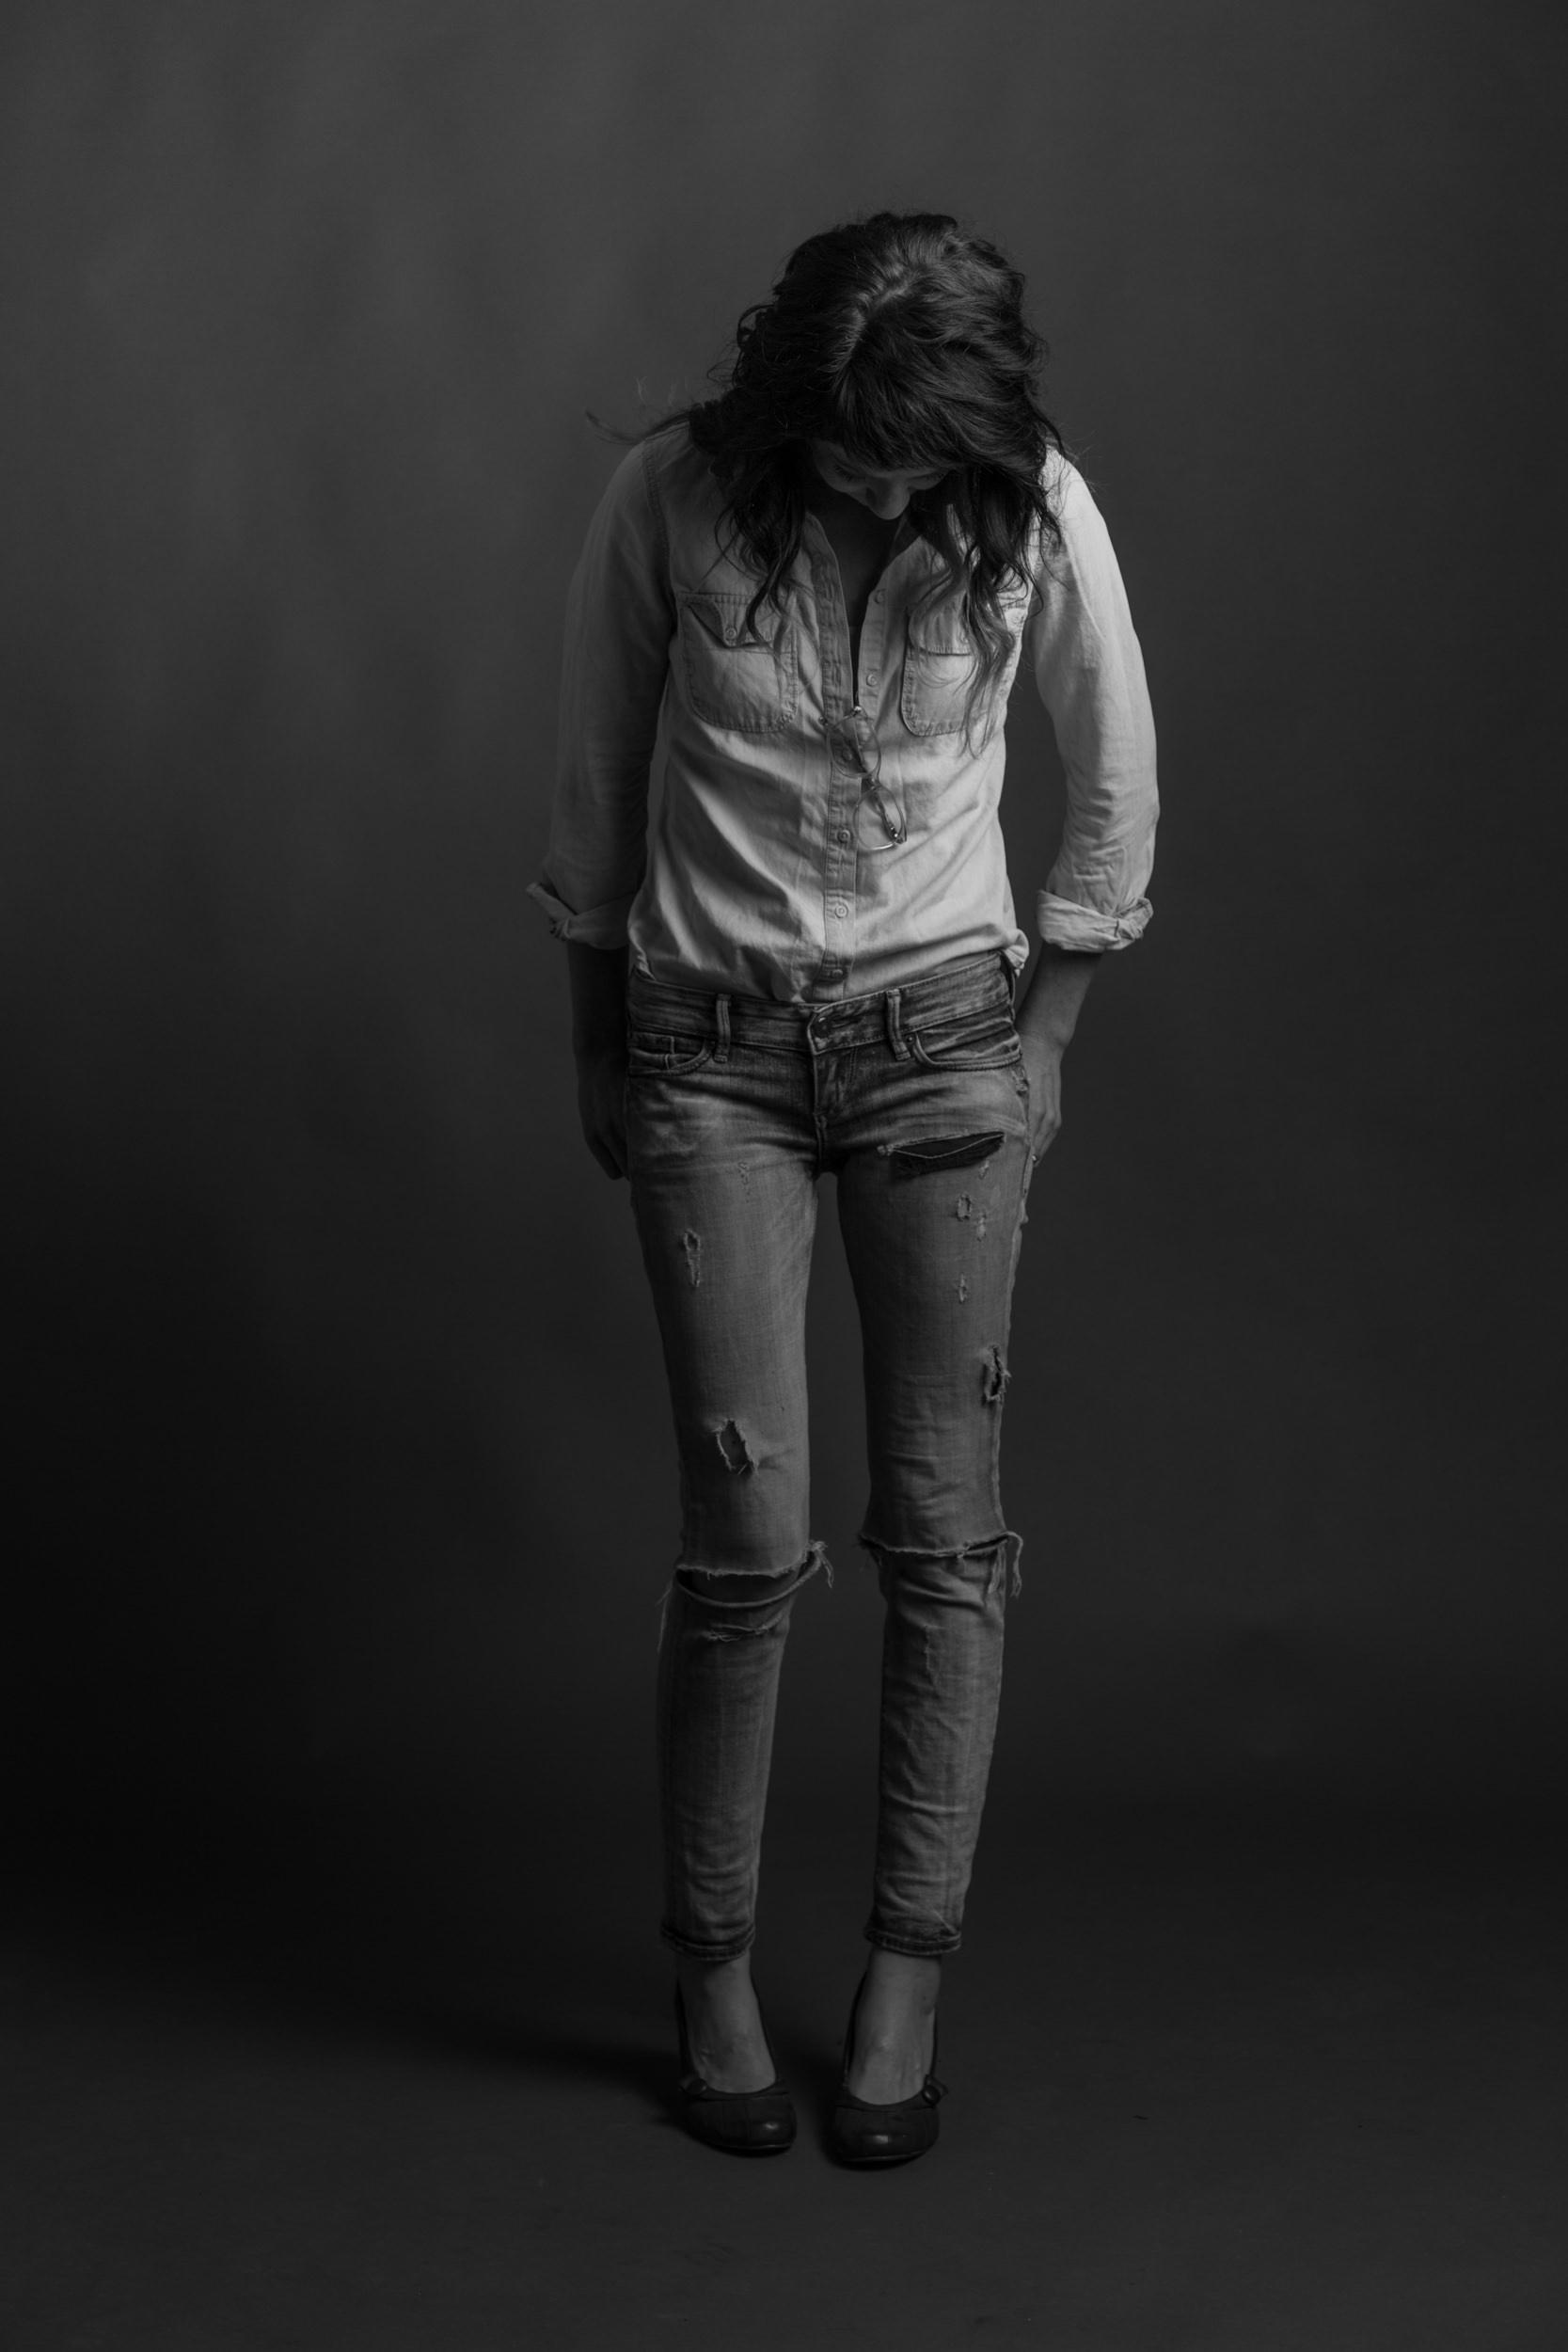 TheSmythCollective-Best-Cincinnati-Portrait-Photographer-008.jpg